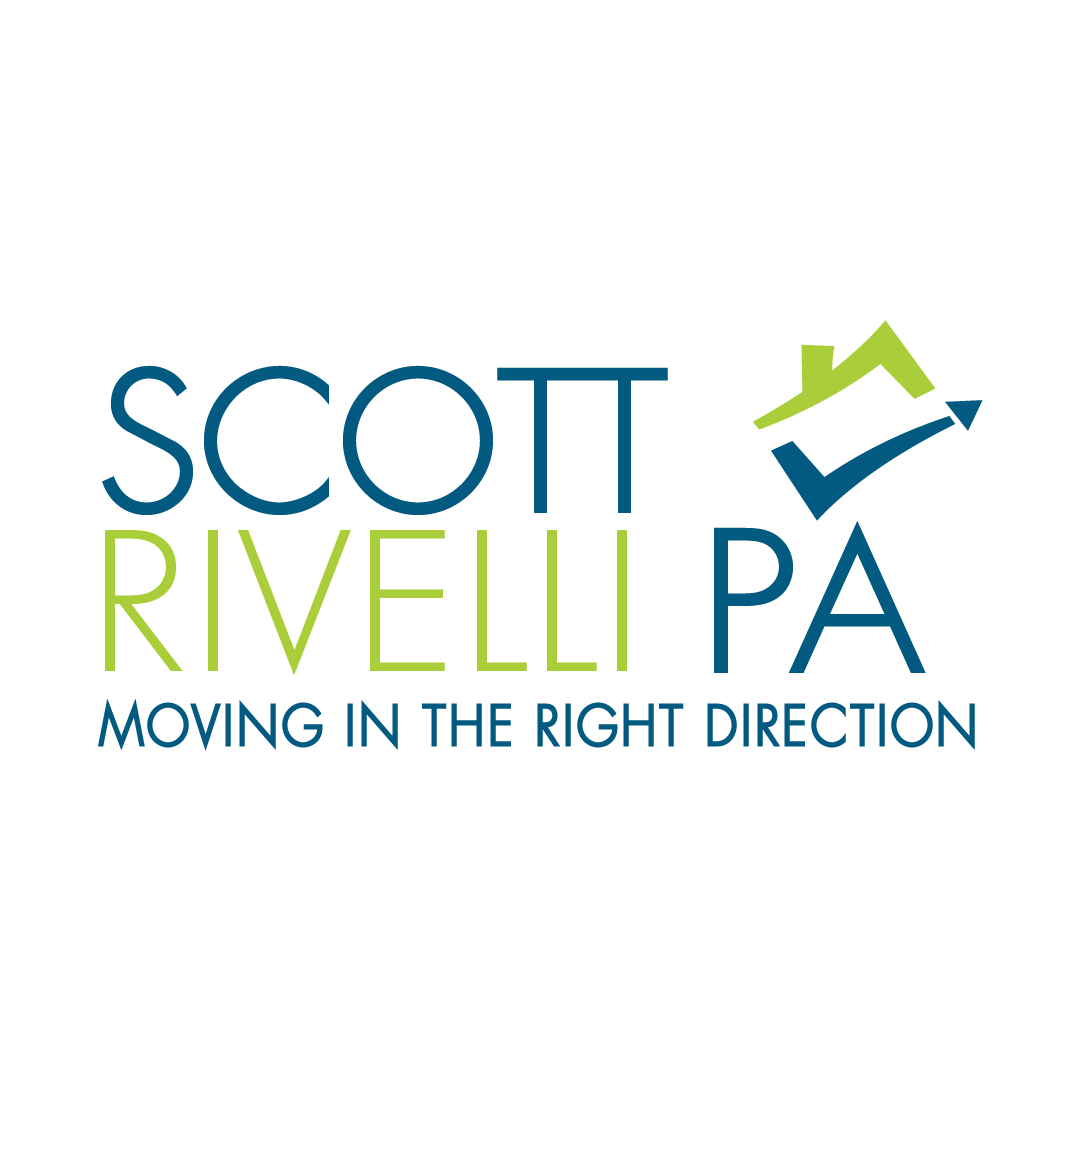 Scott Rivelli